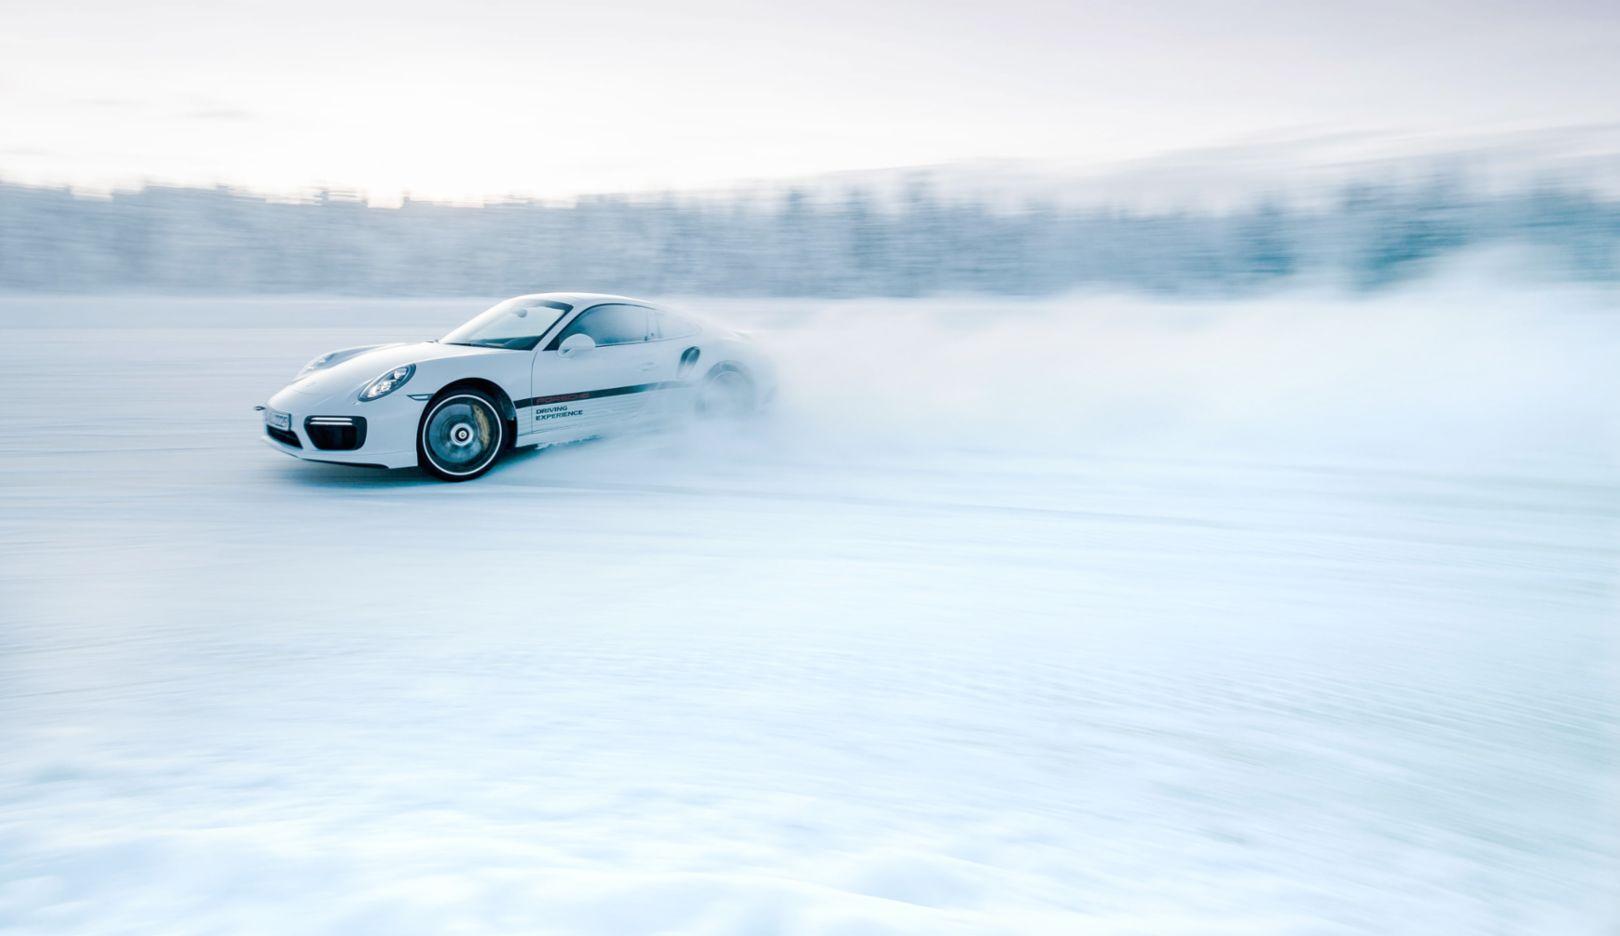 911 Turbo S, Porsche Driving Experience Winter, Levi, Finnland, 2016, Porsche AG